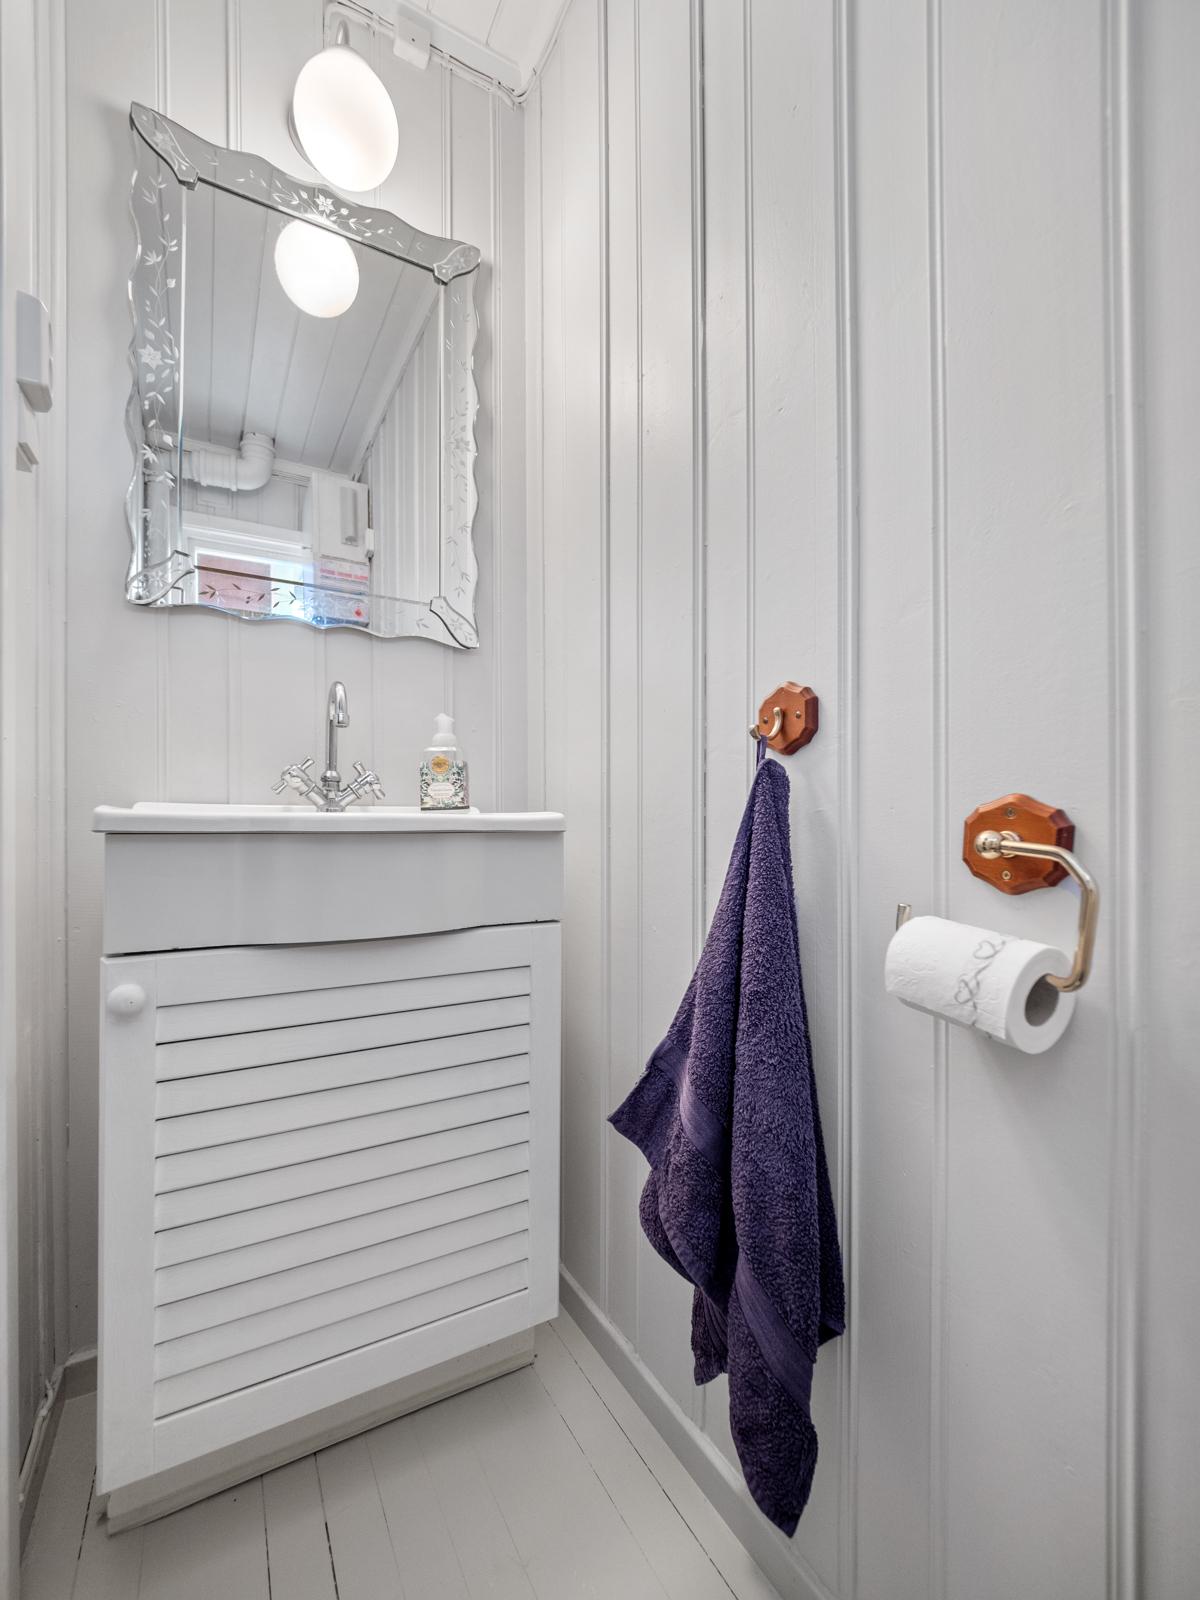 Ekstra wc-rom